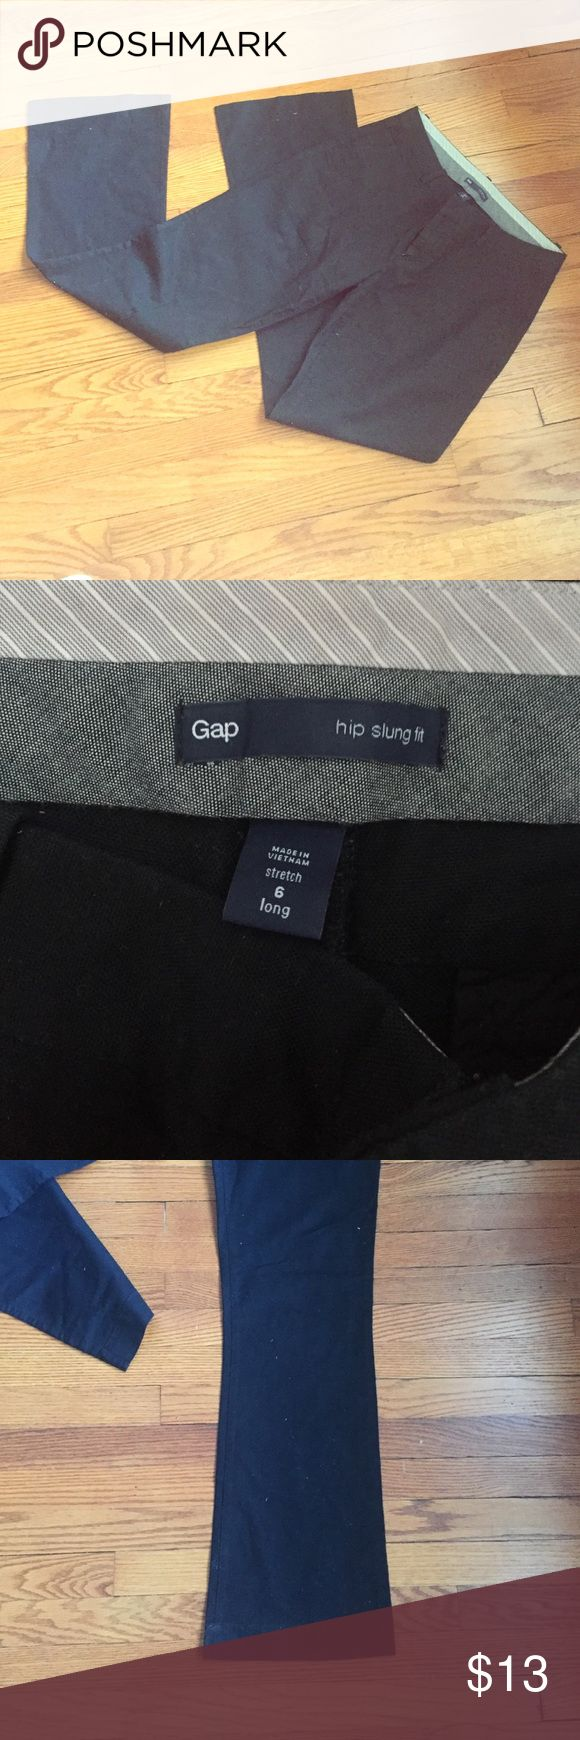 GAP Womens straight leg black pants Gap women's straight leg black pants. Size 6/City fit. Excellent condition! Amazing work pants GAP Pants Straight Leg